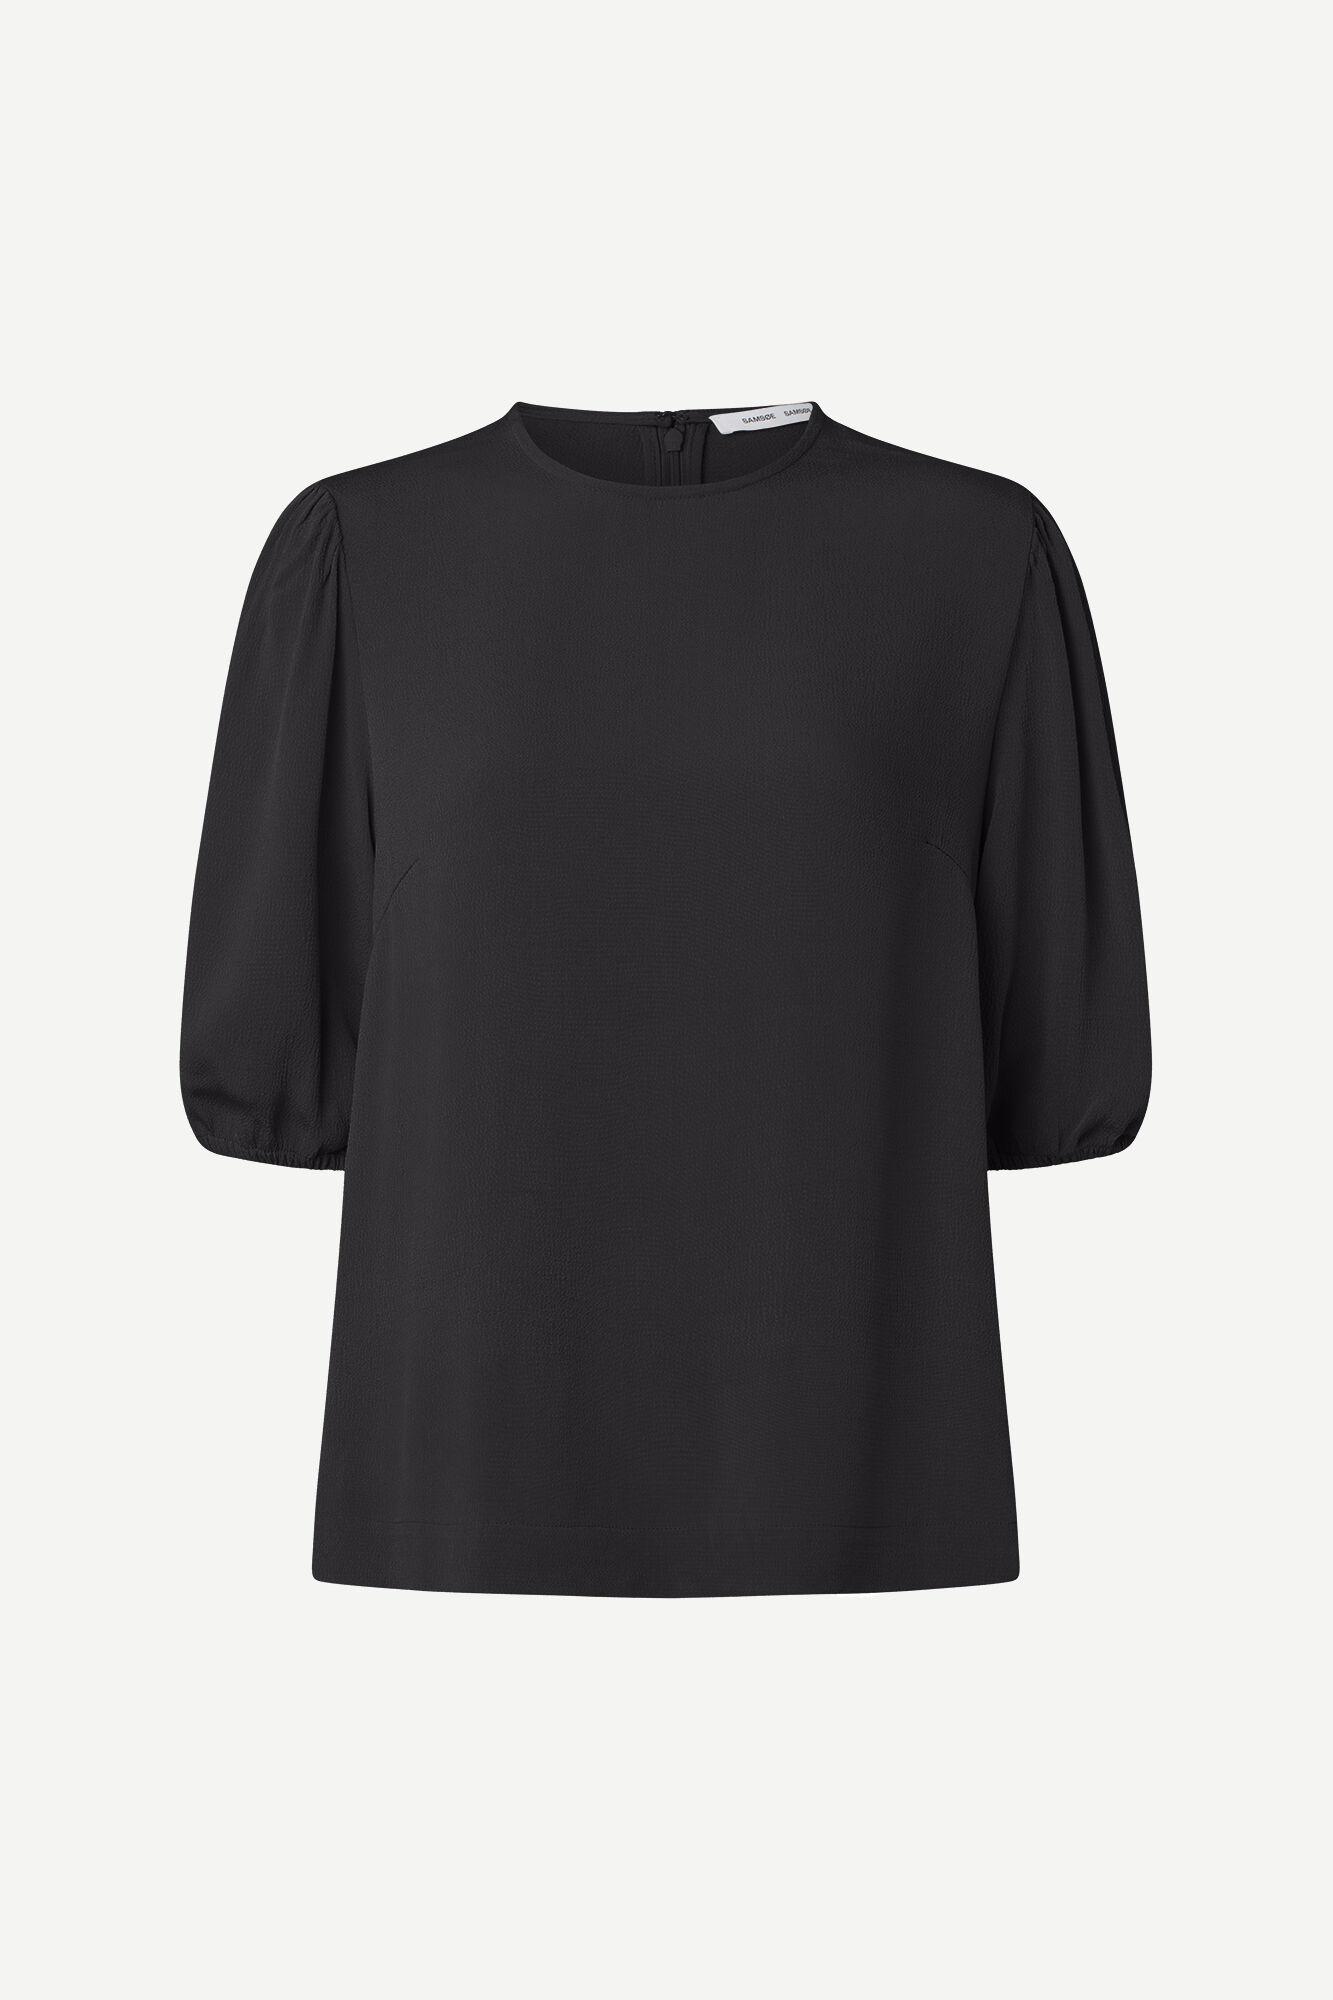 Aram ss blouse 12949